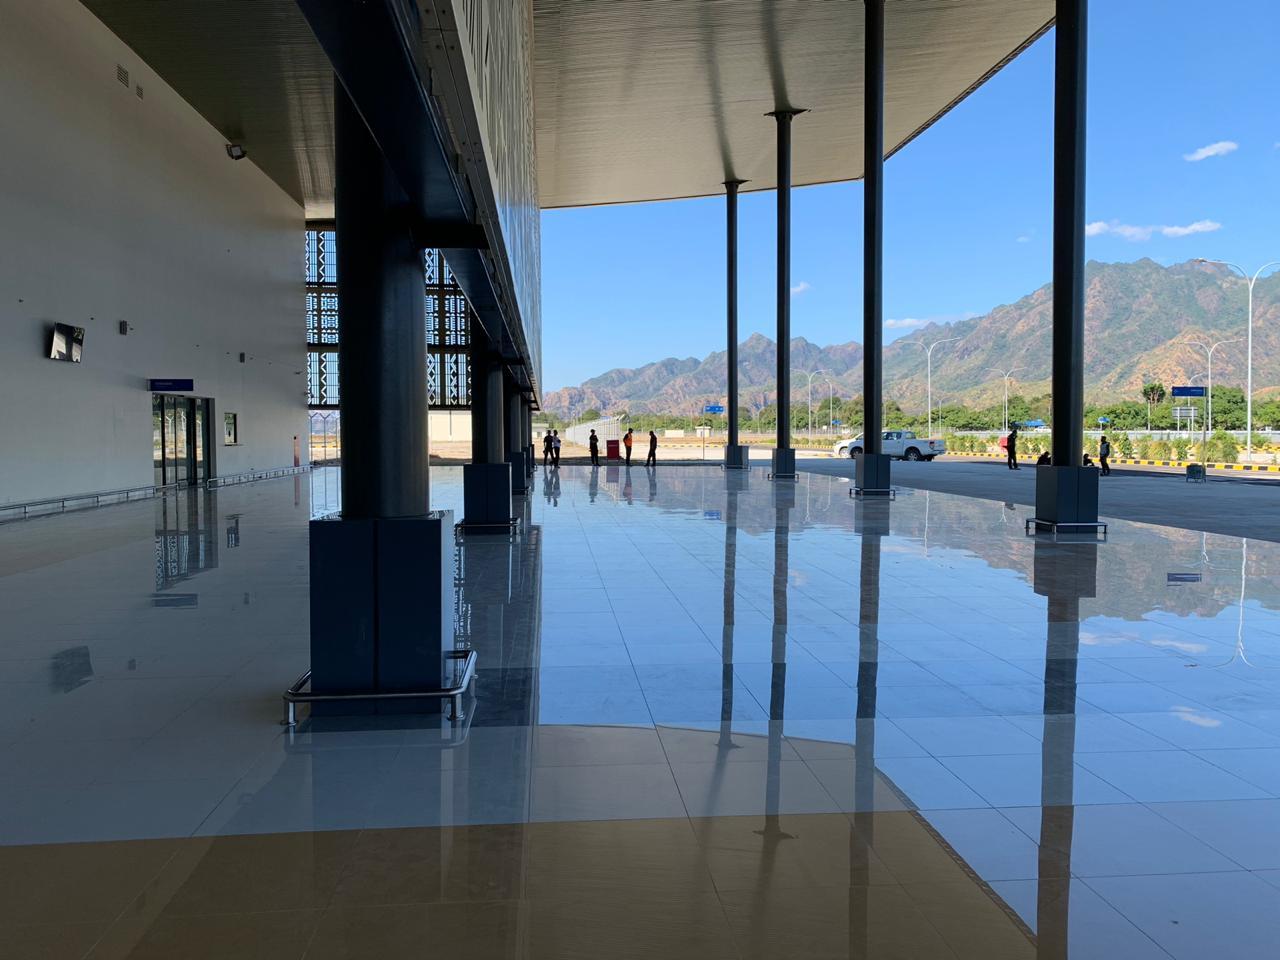 https: img.okezone.com content 2019 06 19 320 2068420 wika-rampungkan-pembangunan-bandara-internasional-oecusse-timor-leste-j6KRrhXj2l.jpg